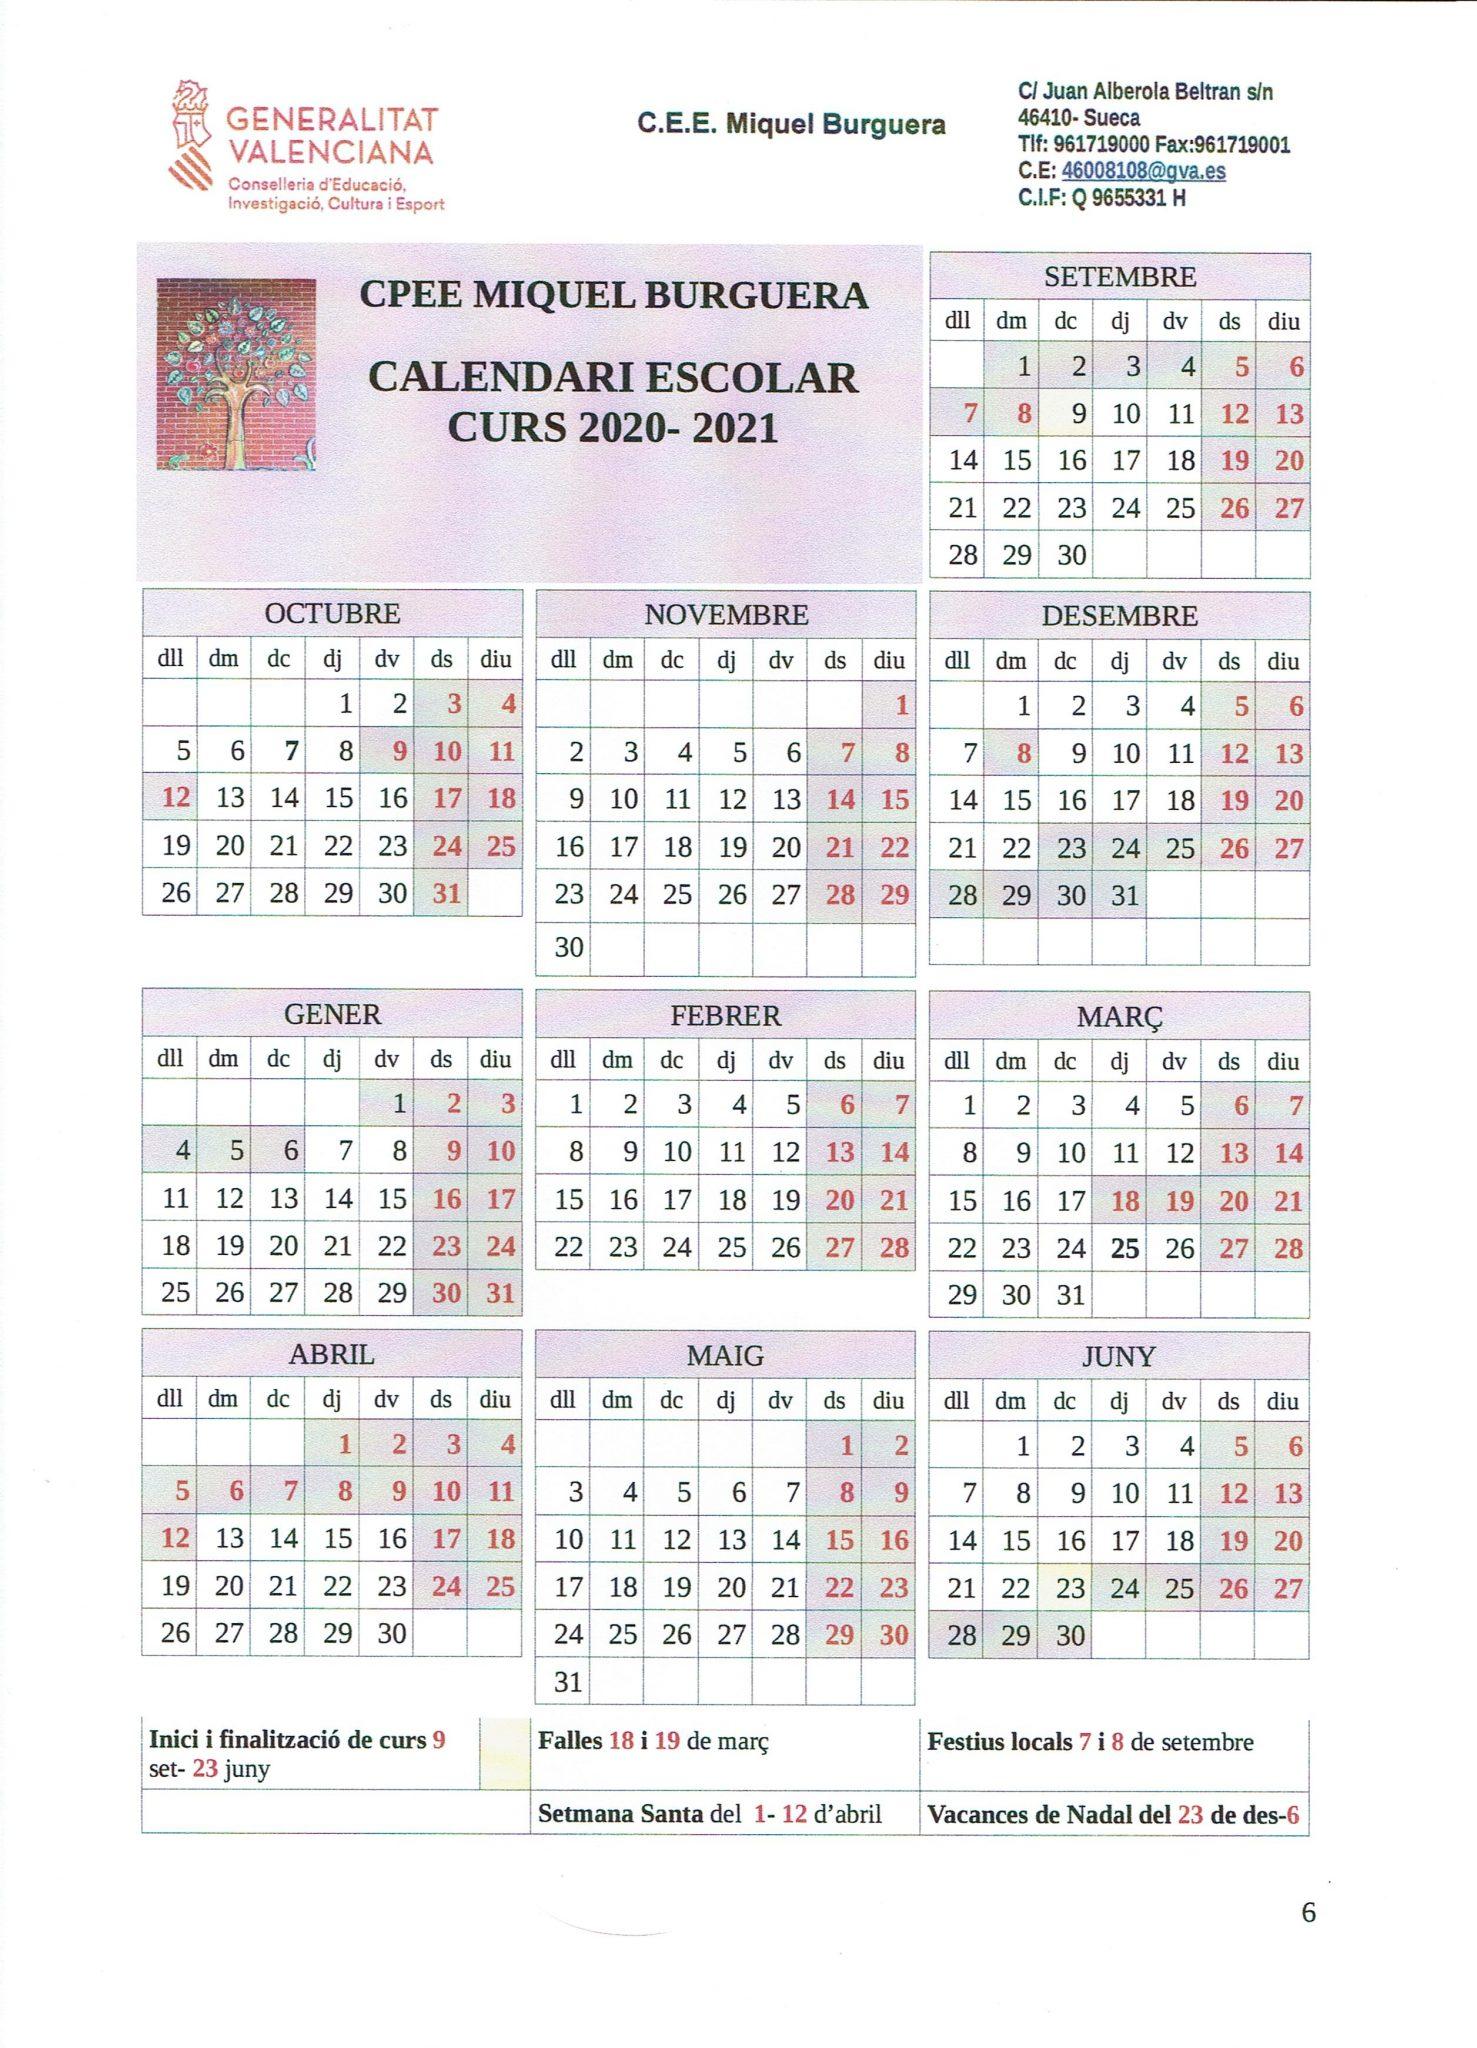 Calendari 20-21